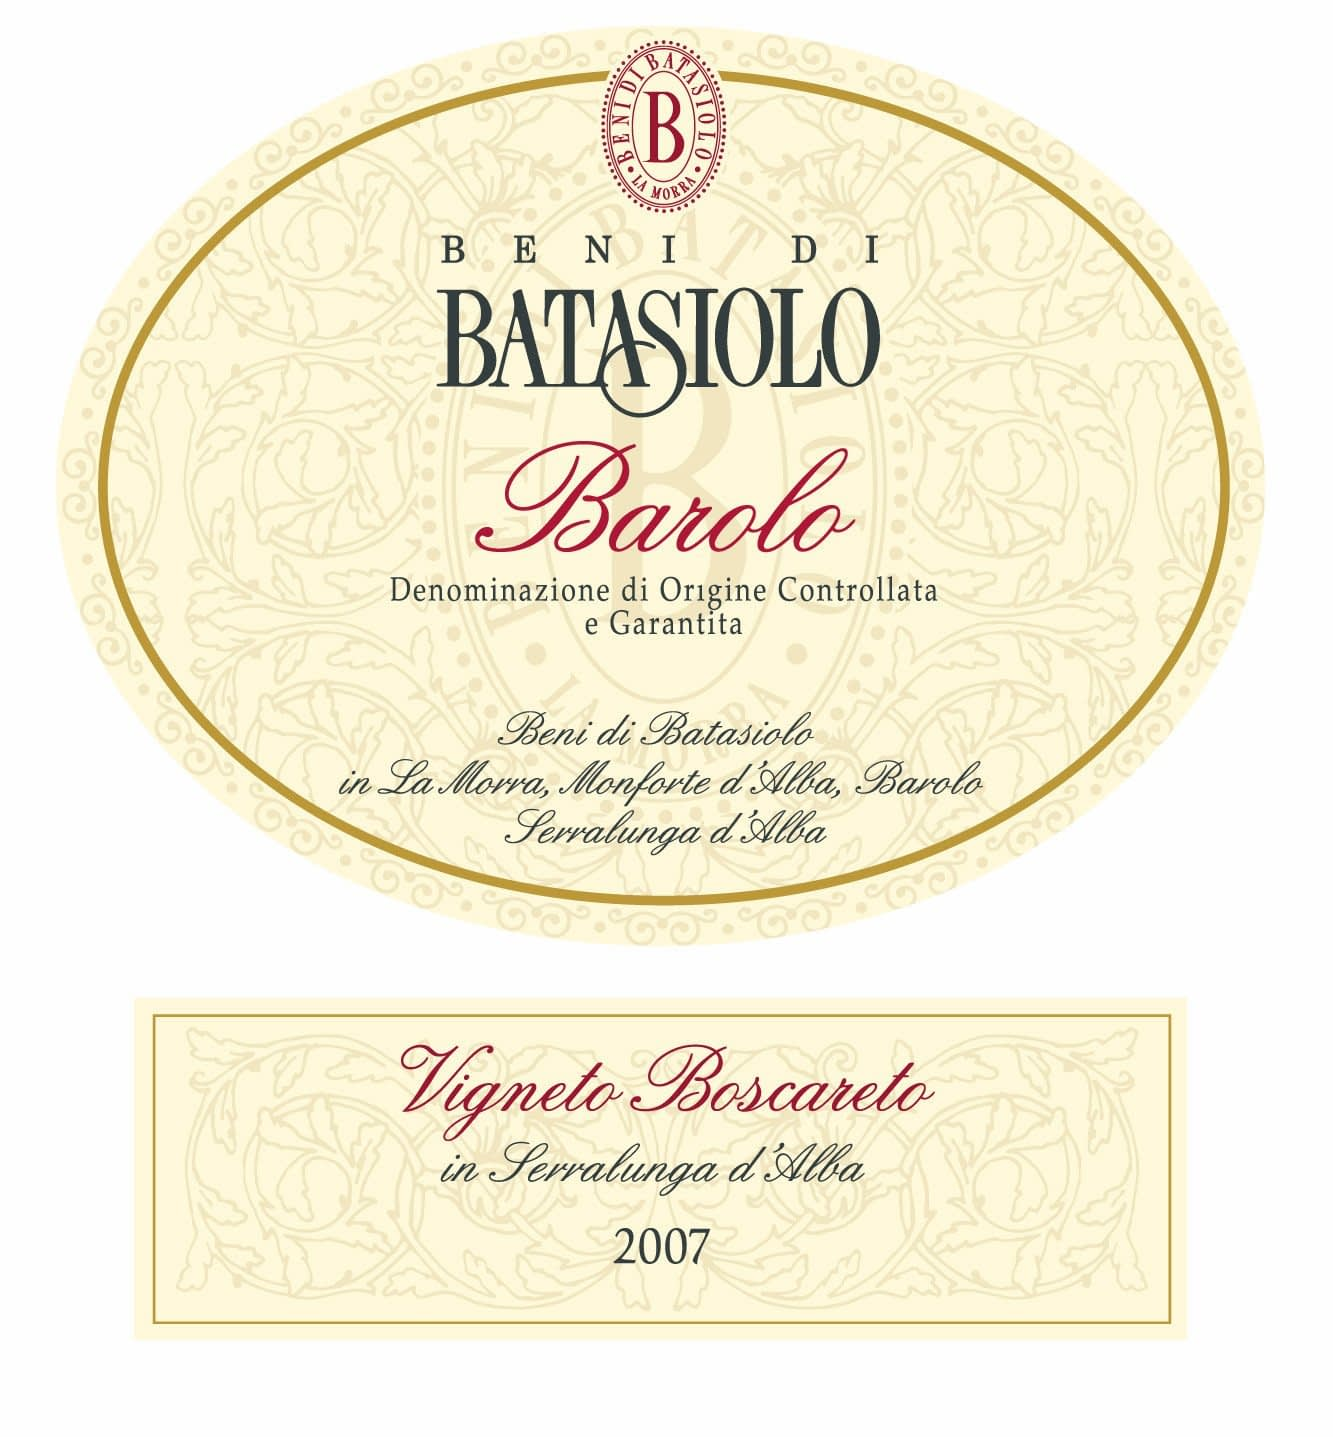 Batasiolo Barolo Boscareto 2007